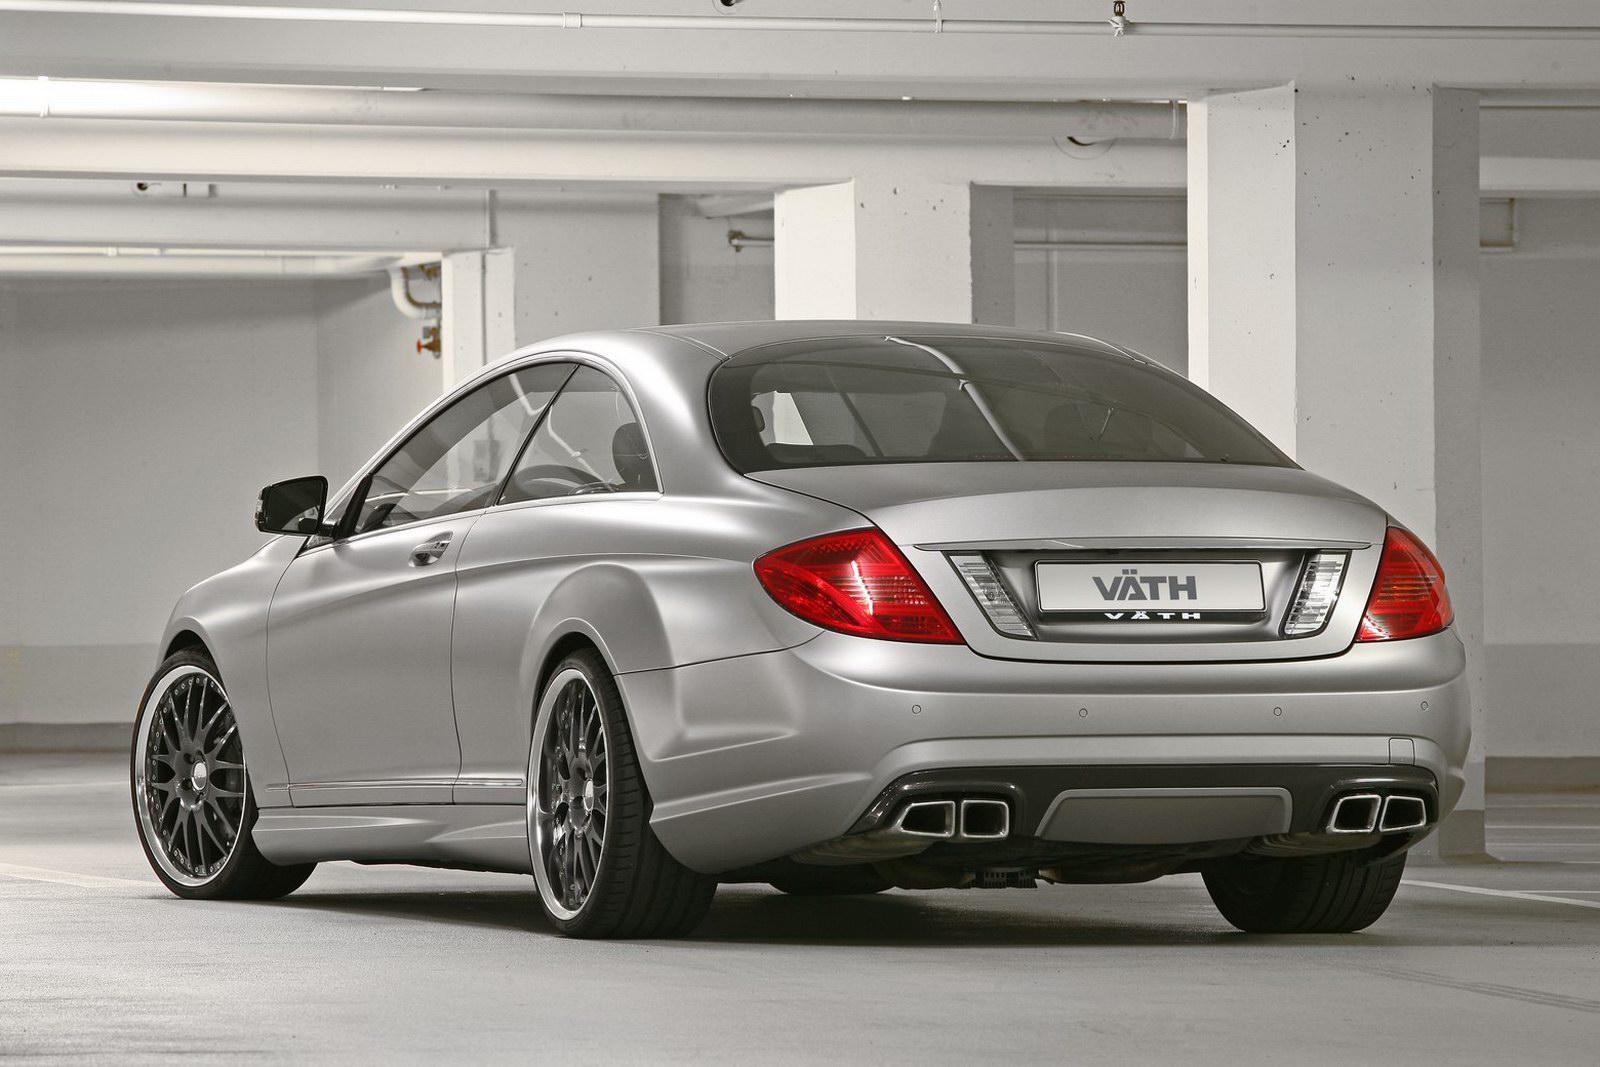 Mercedes-Bent CL 63 AMG a nárust výkonu od Väth 6